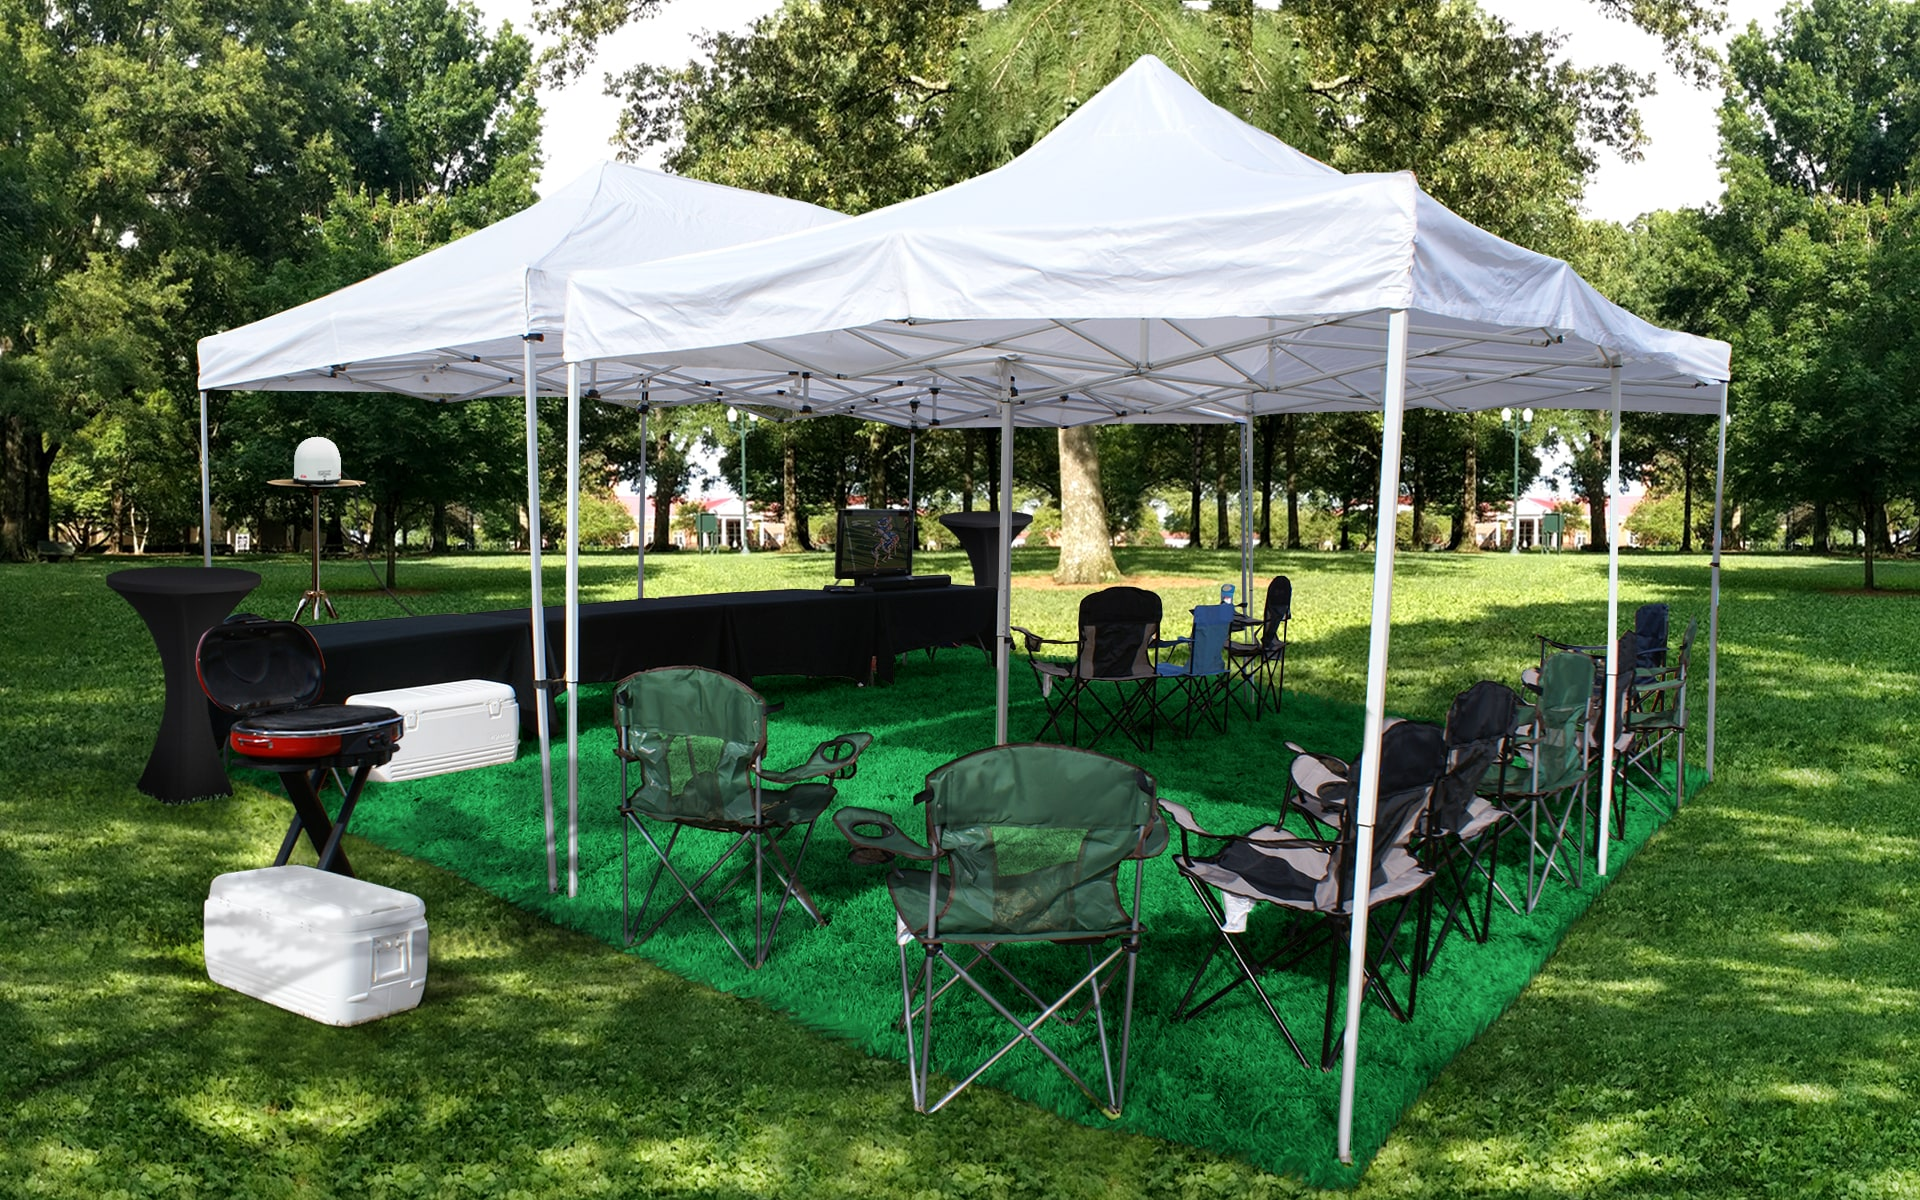 large-tent-tailgate-setup-company